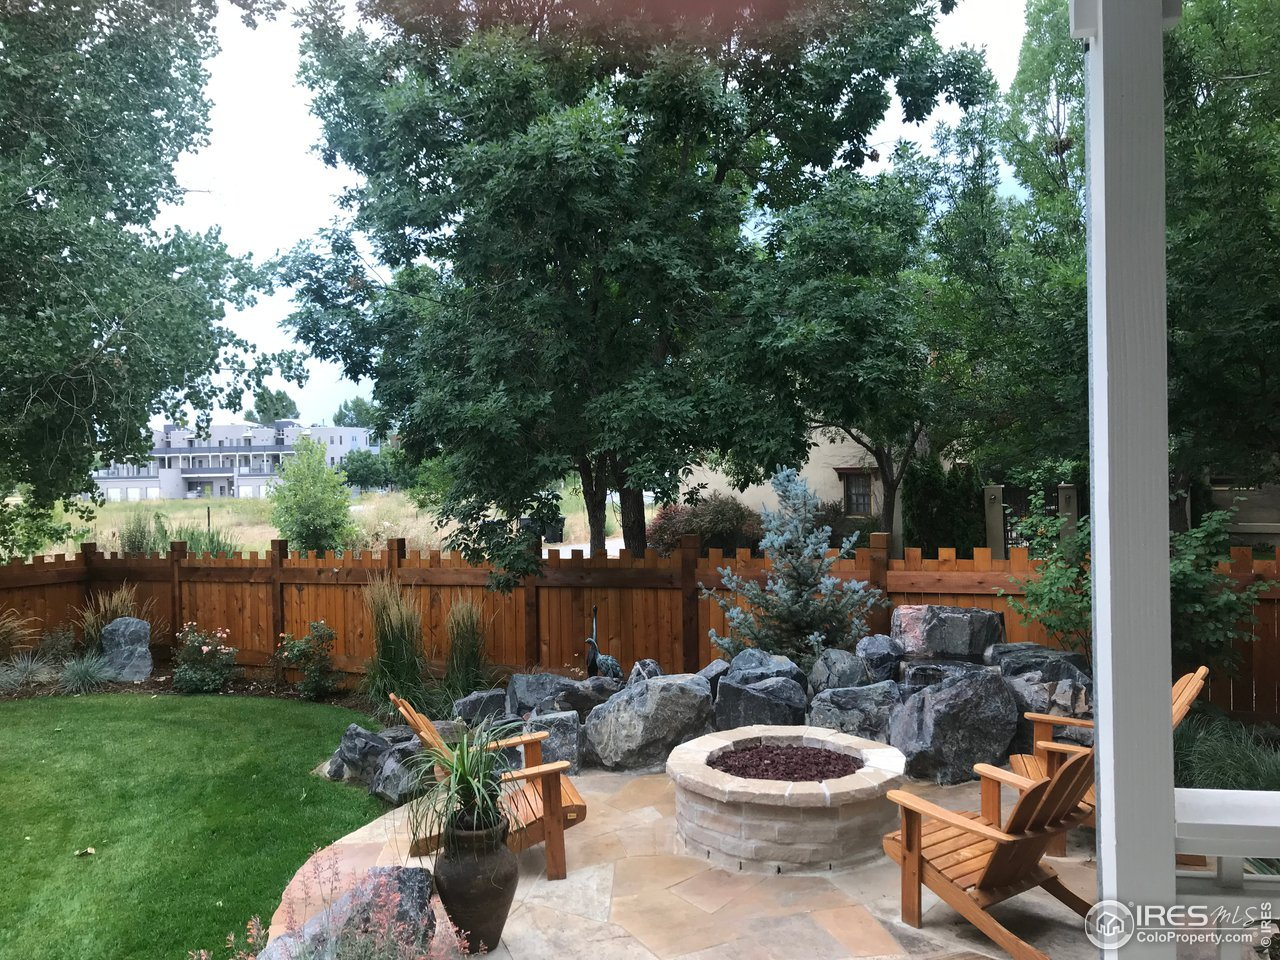 Professional Landscaping w/ Custom Wood Fence